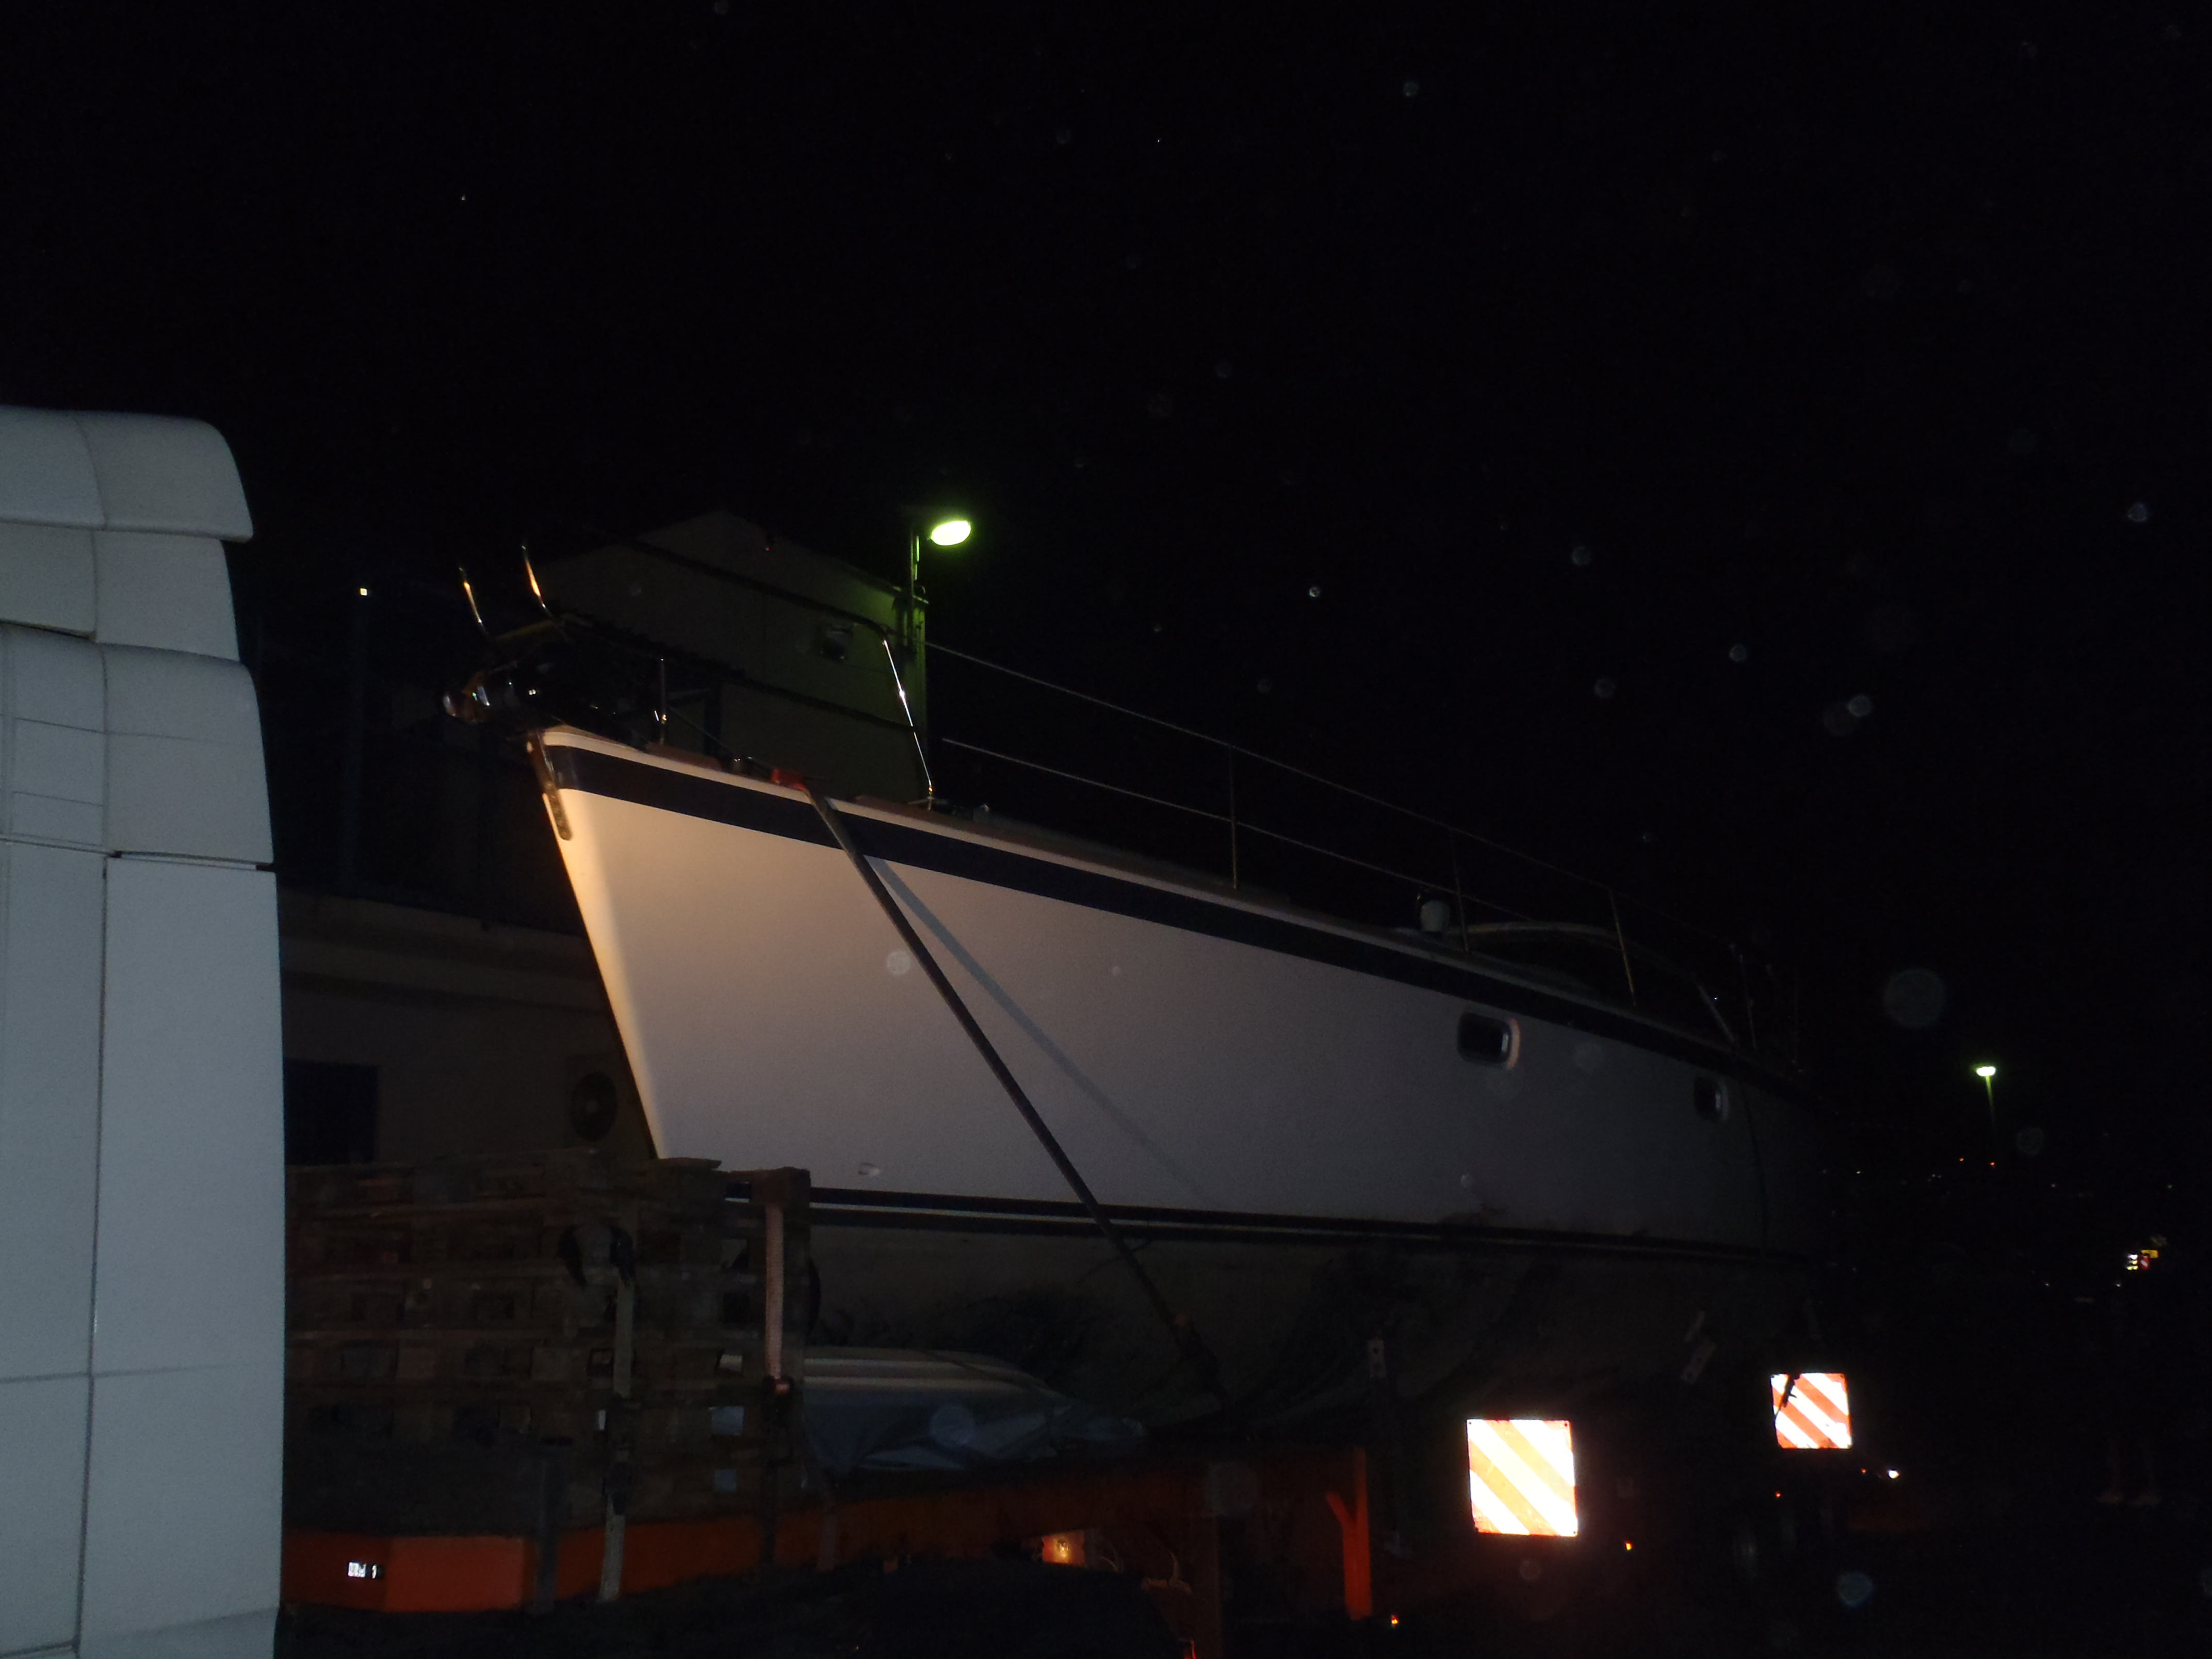 Og så kom båden - meget senere.jpg